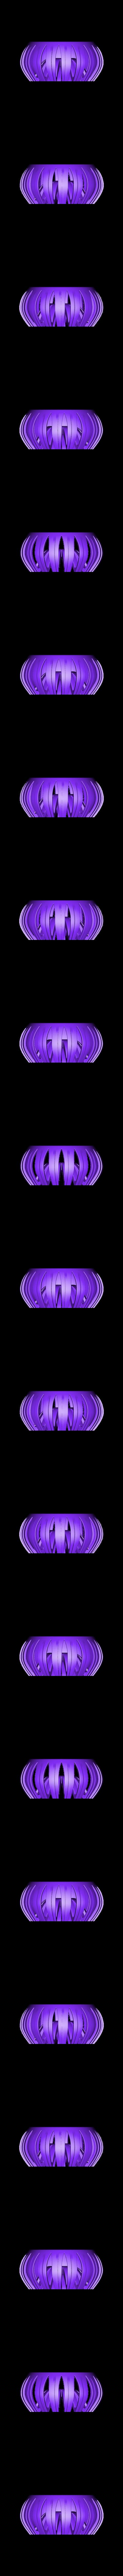 Palmiga_springy-fun-wheel_3.stl Télécharger fichier STL gratuit OpenRC Truggy Springy Fun Wheels • Design imprimable en 3D, Palmiga